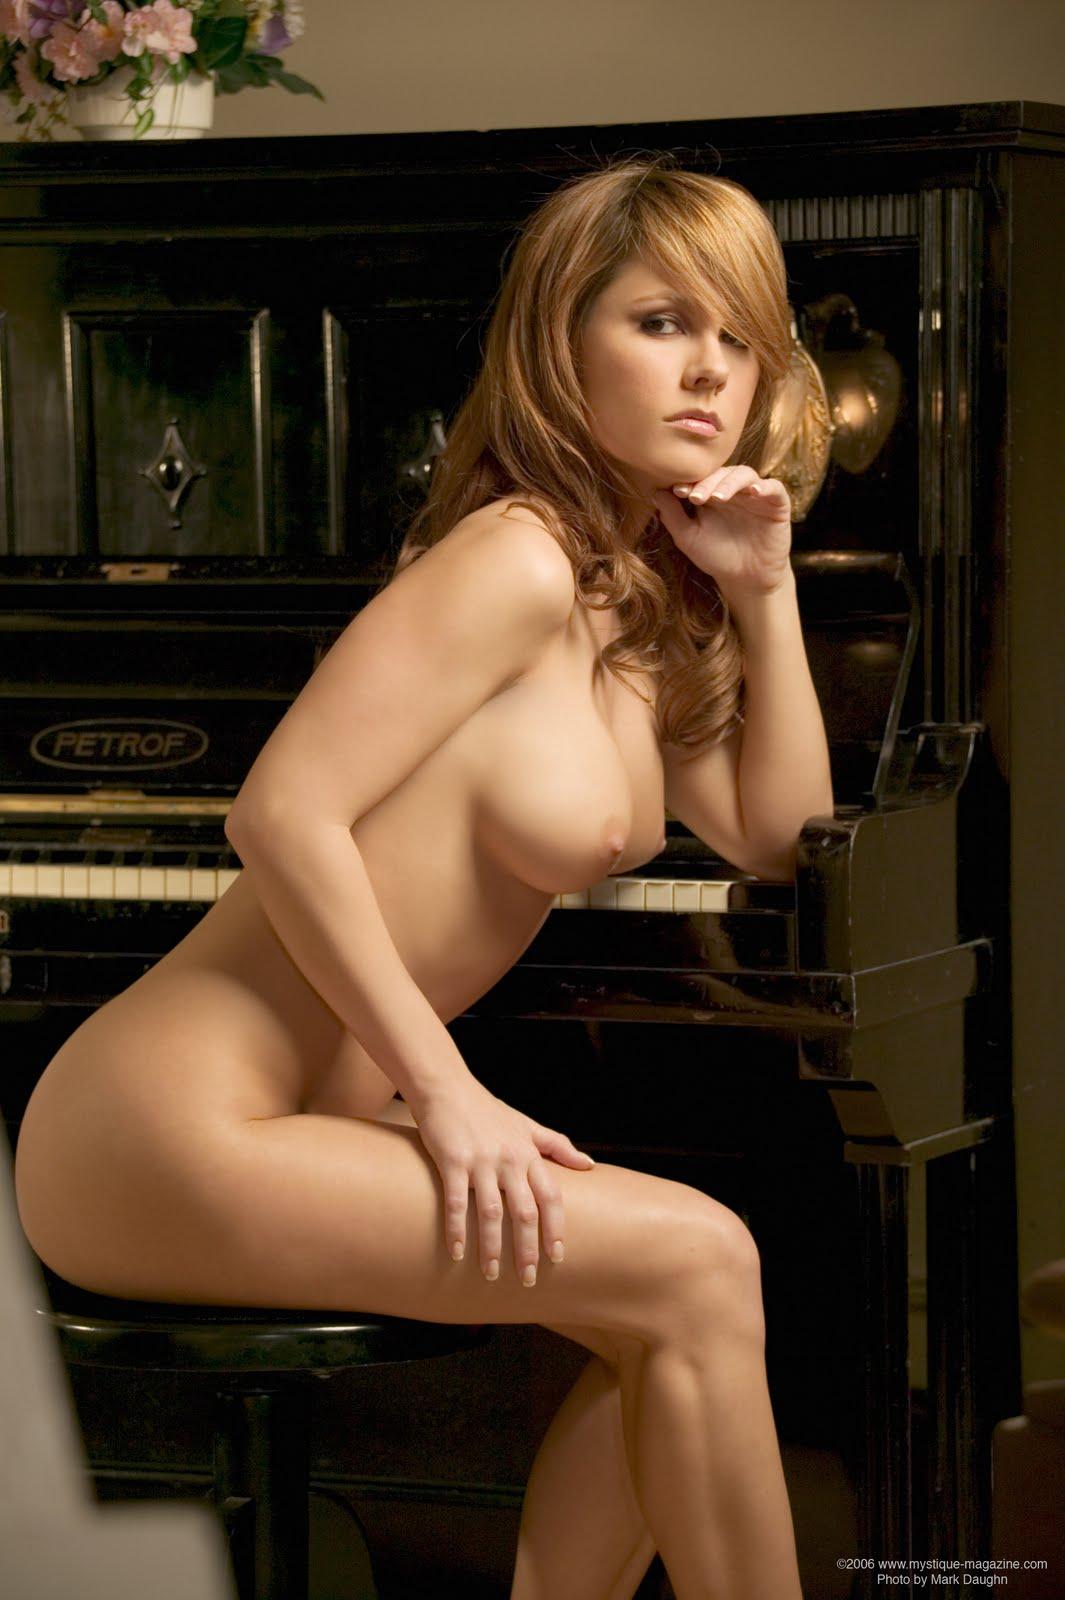 valerie baber photos nude